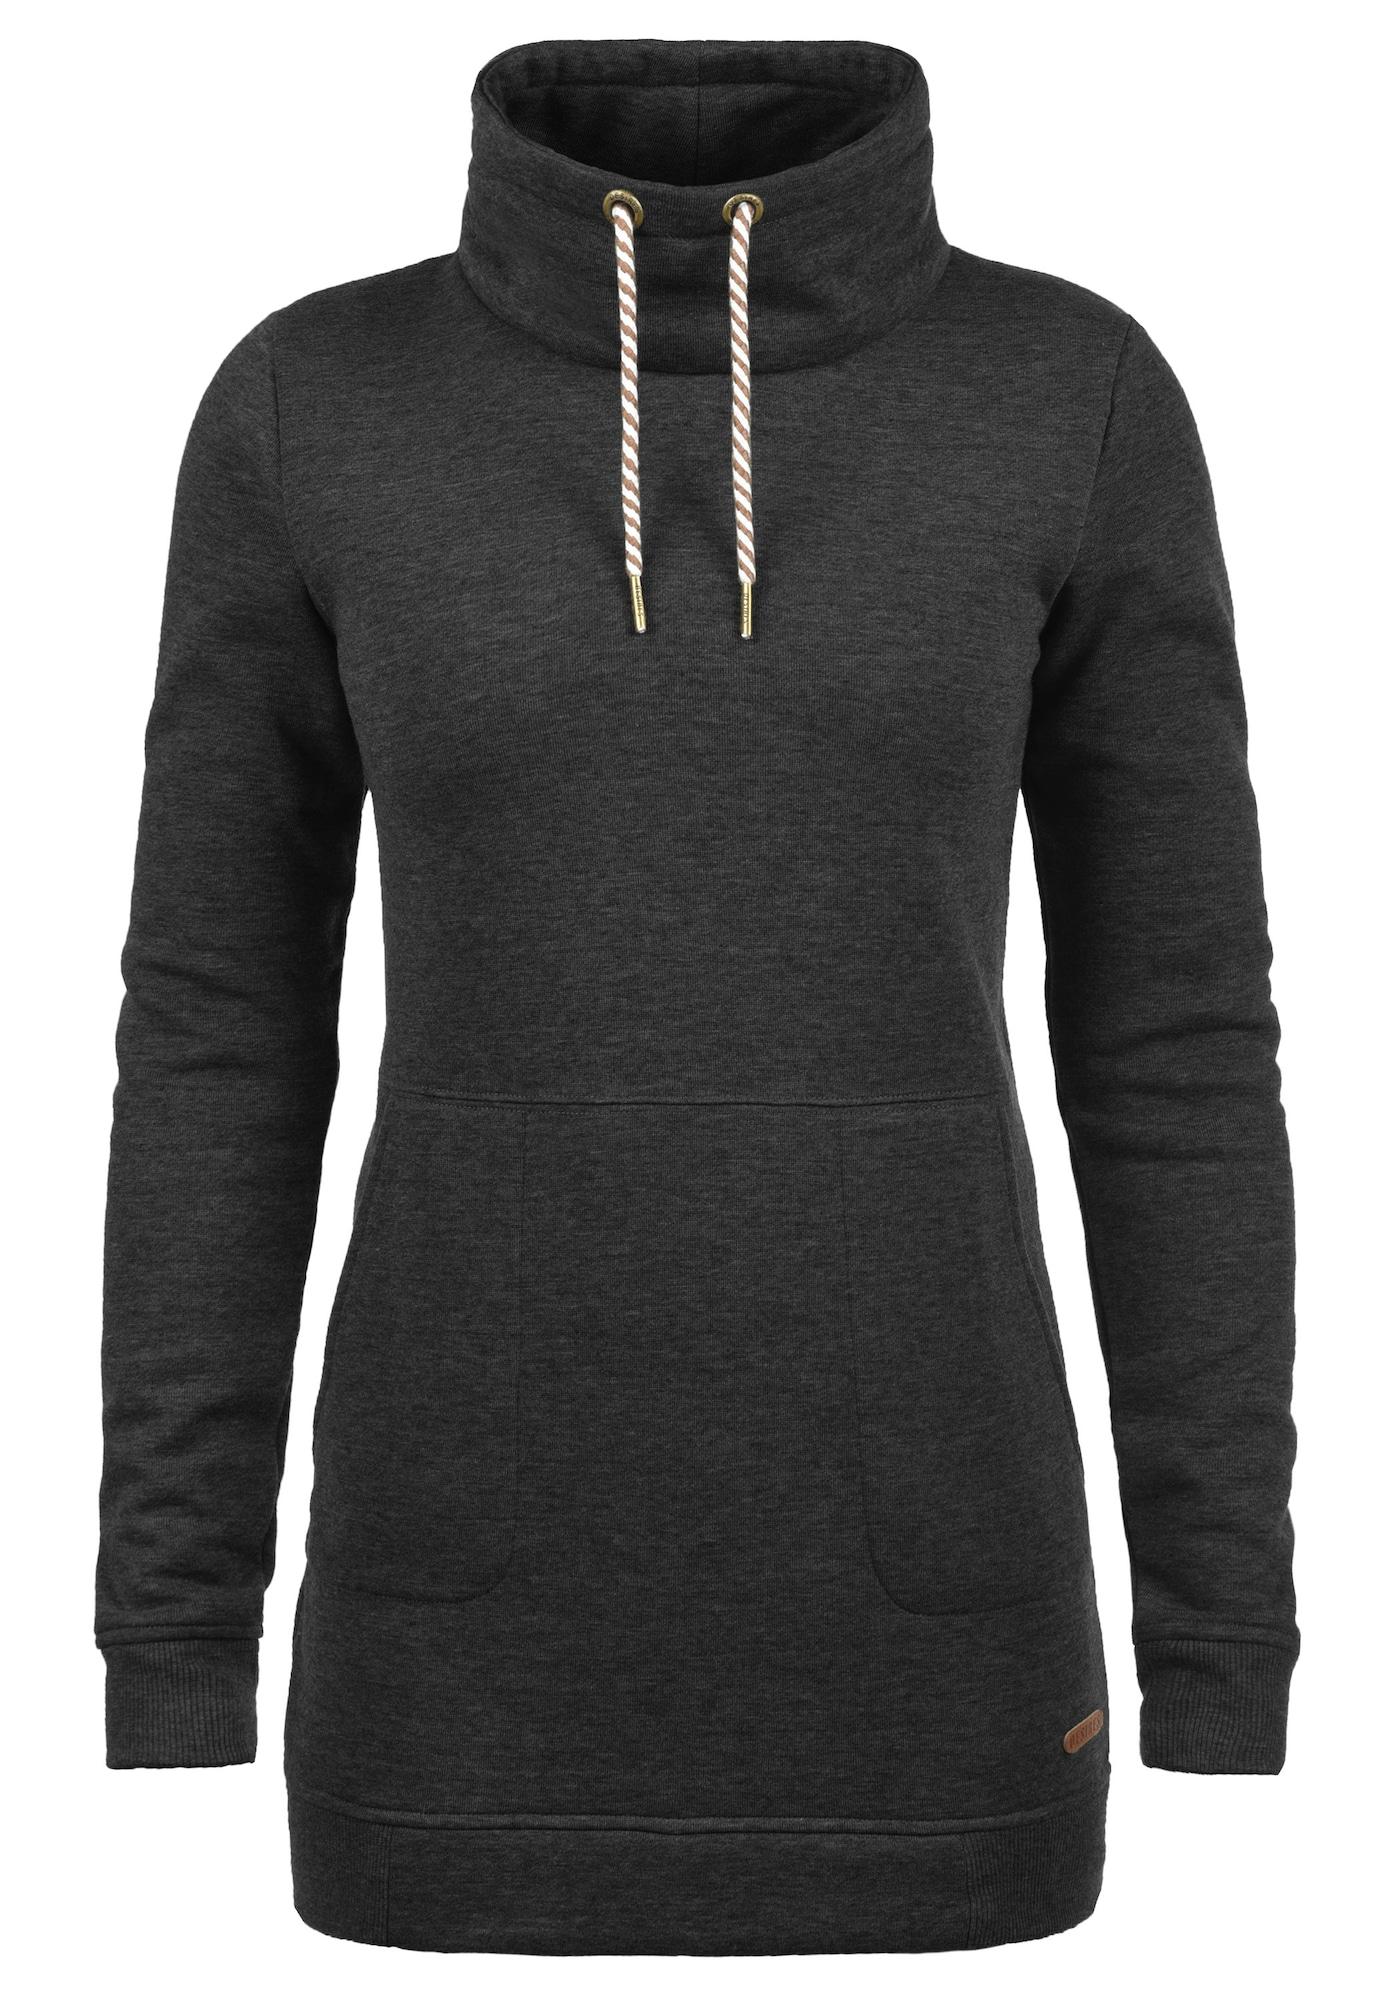 Sweatshirt 'Vilma' | Bekleidung > Sweatshirts & -jacken > Sweatshirts | Grau | Desires